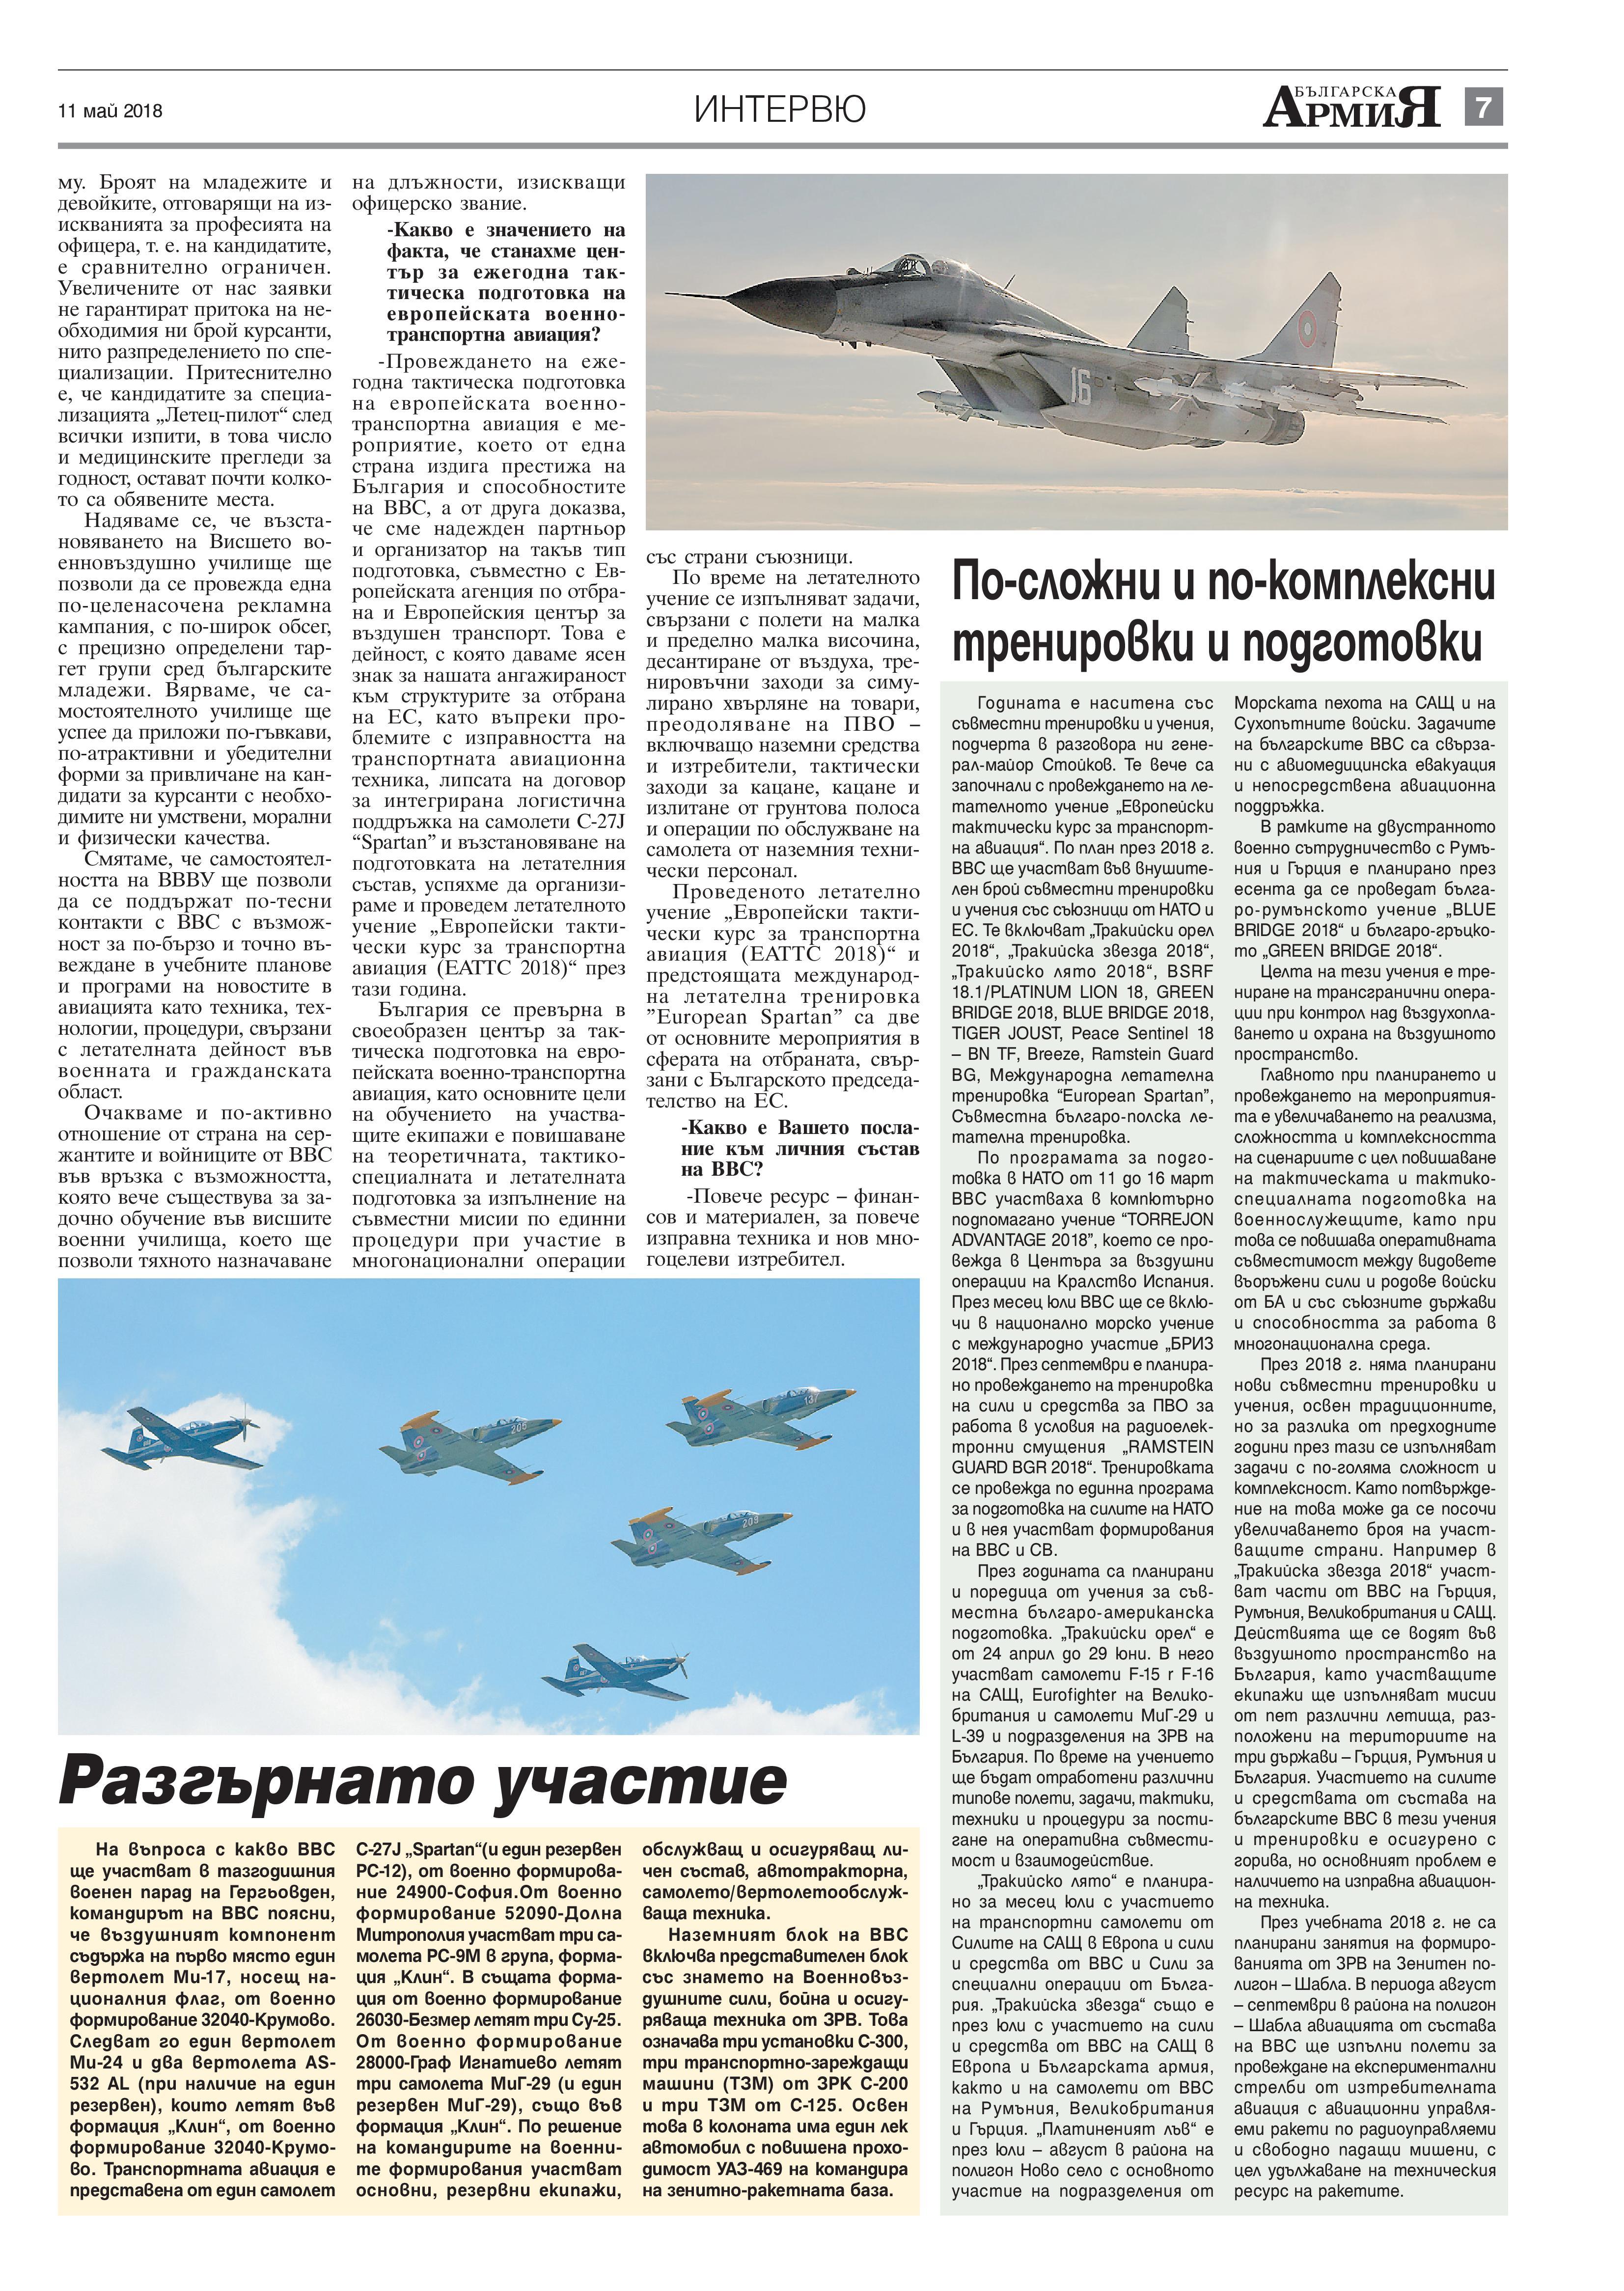 https://armymedia.bg/wp-content/uploads/2015/06/07-20.jpg